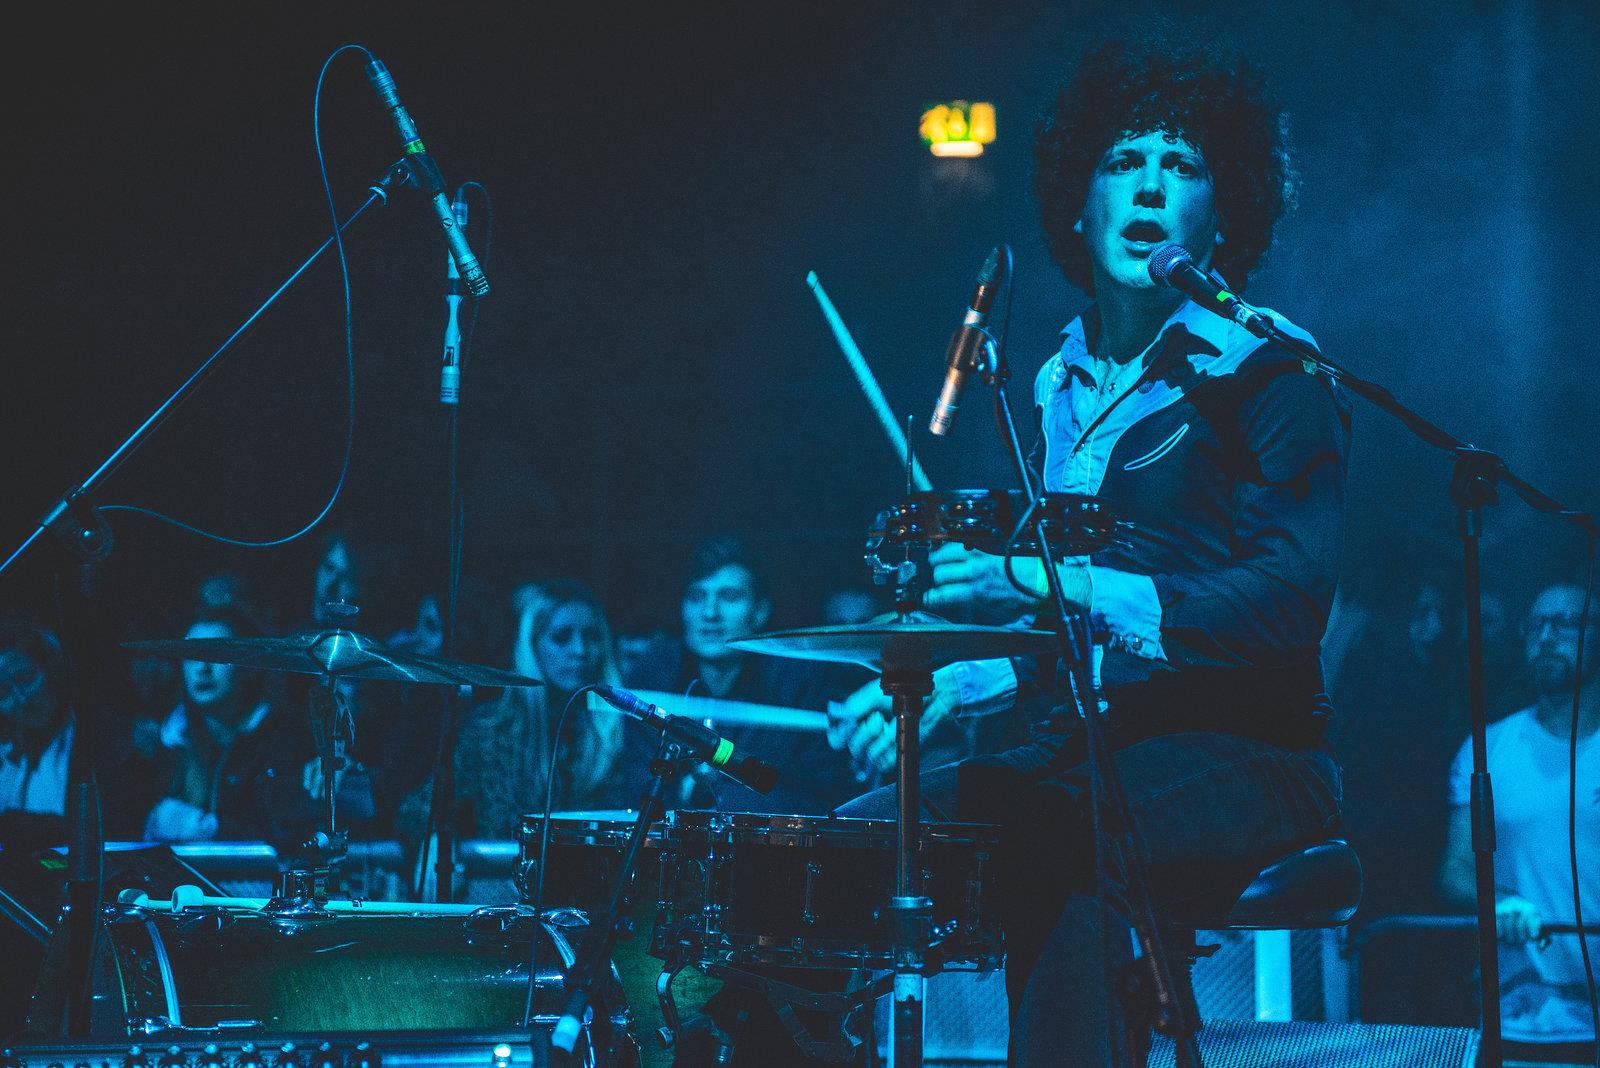 The Black Lips at The Coronet, November 2017